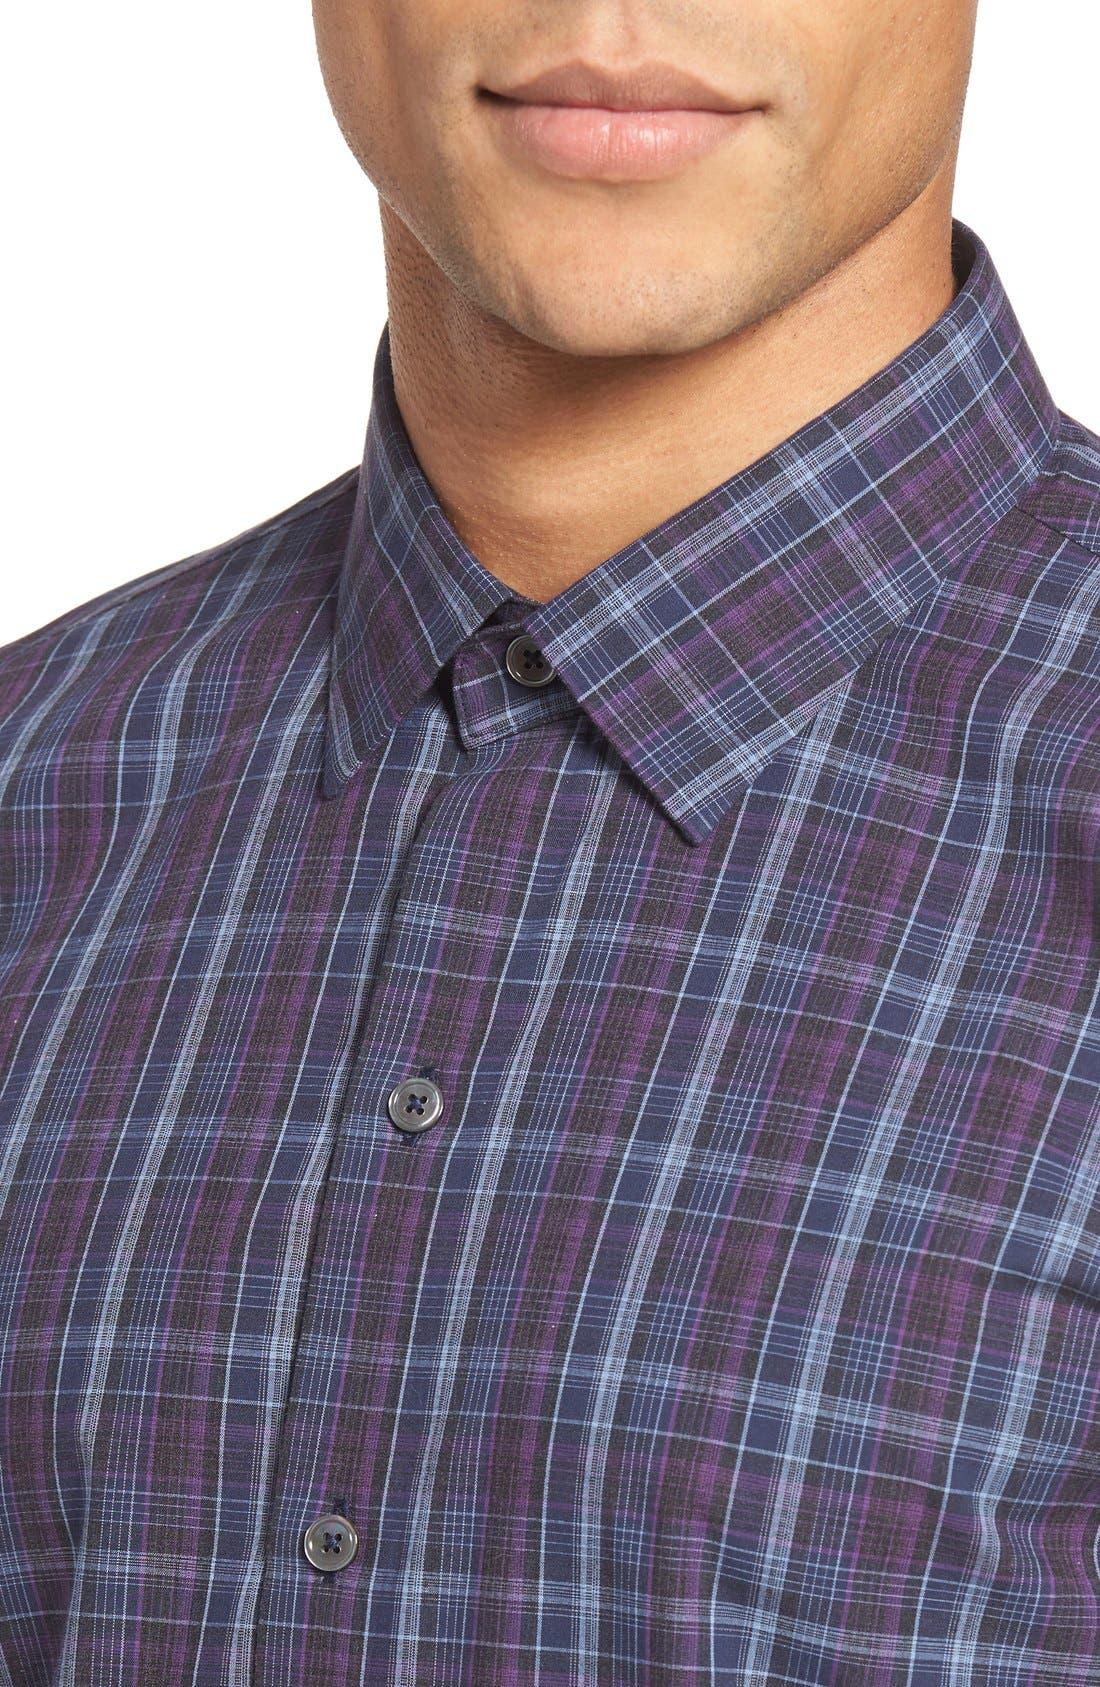 Bulatao Trim Fit Plaid Sport Shirt,                             Alternate thumbnail 2, color,                             500